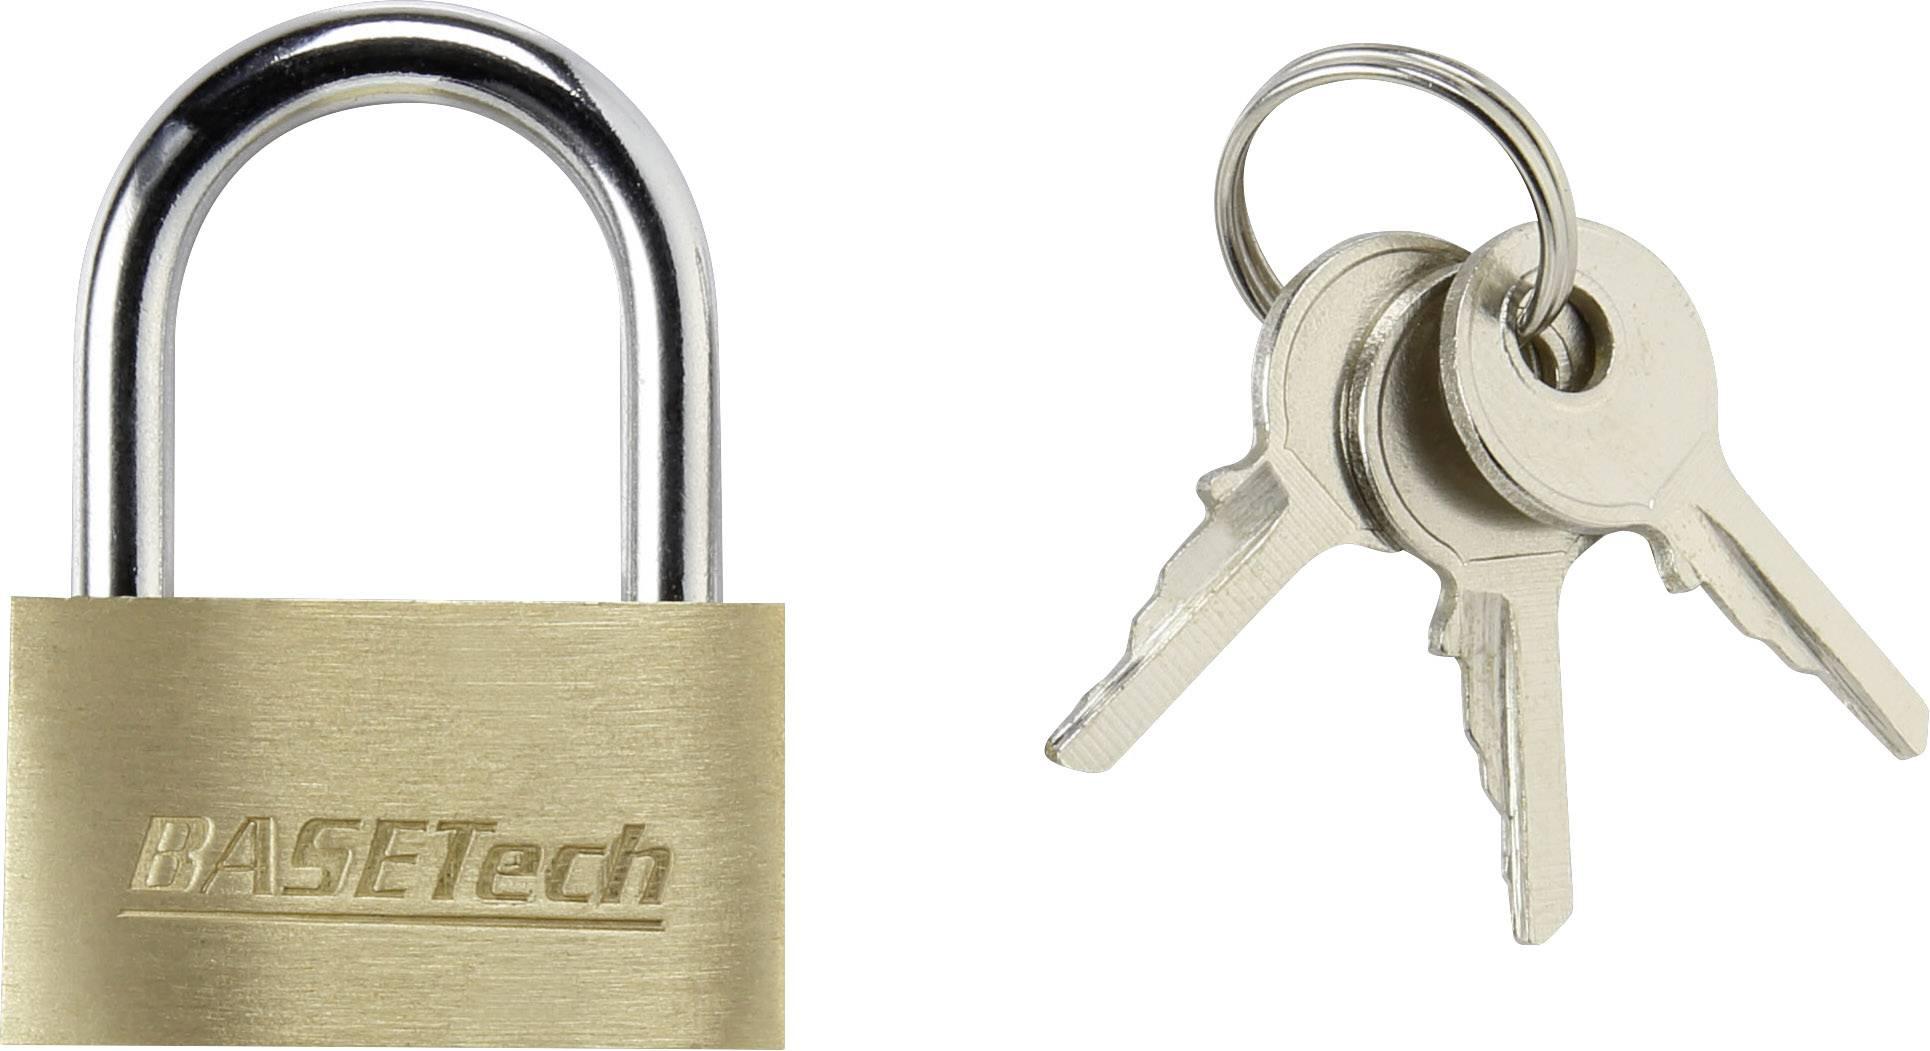 Visiaci zámok na kľúč Basetech 1363031, 29.8 mm, mosadz